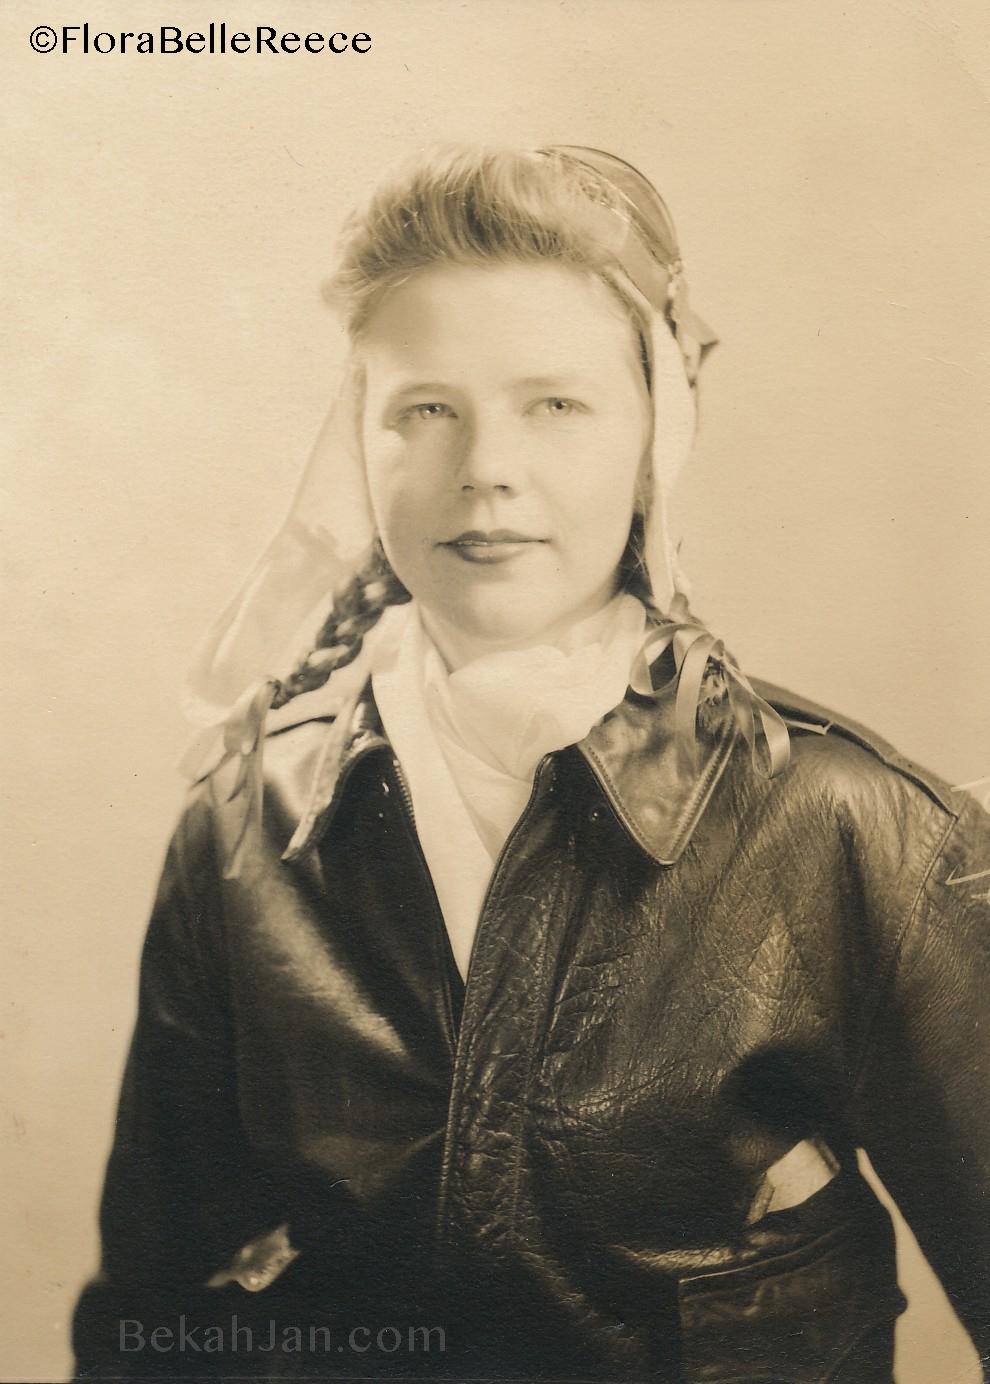 Flora Belle Reece